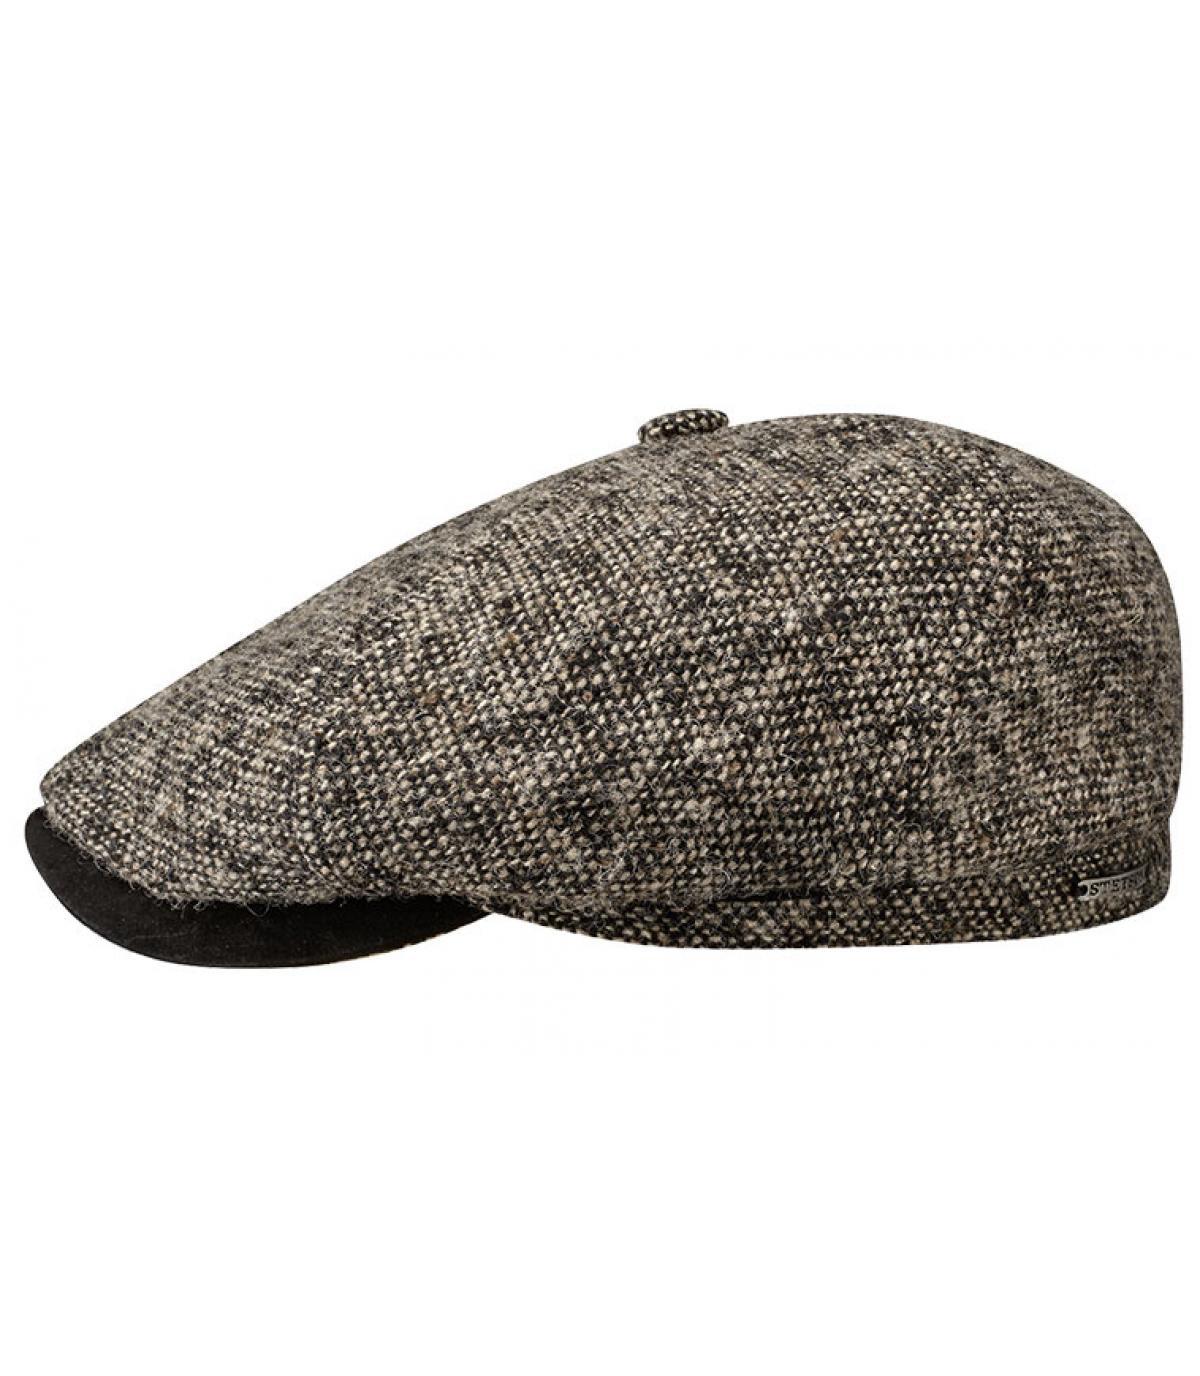 Brown irish cap Stetson